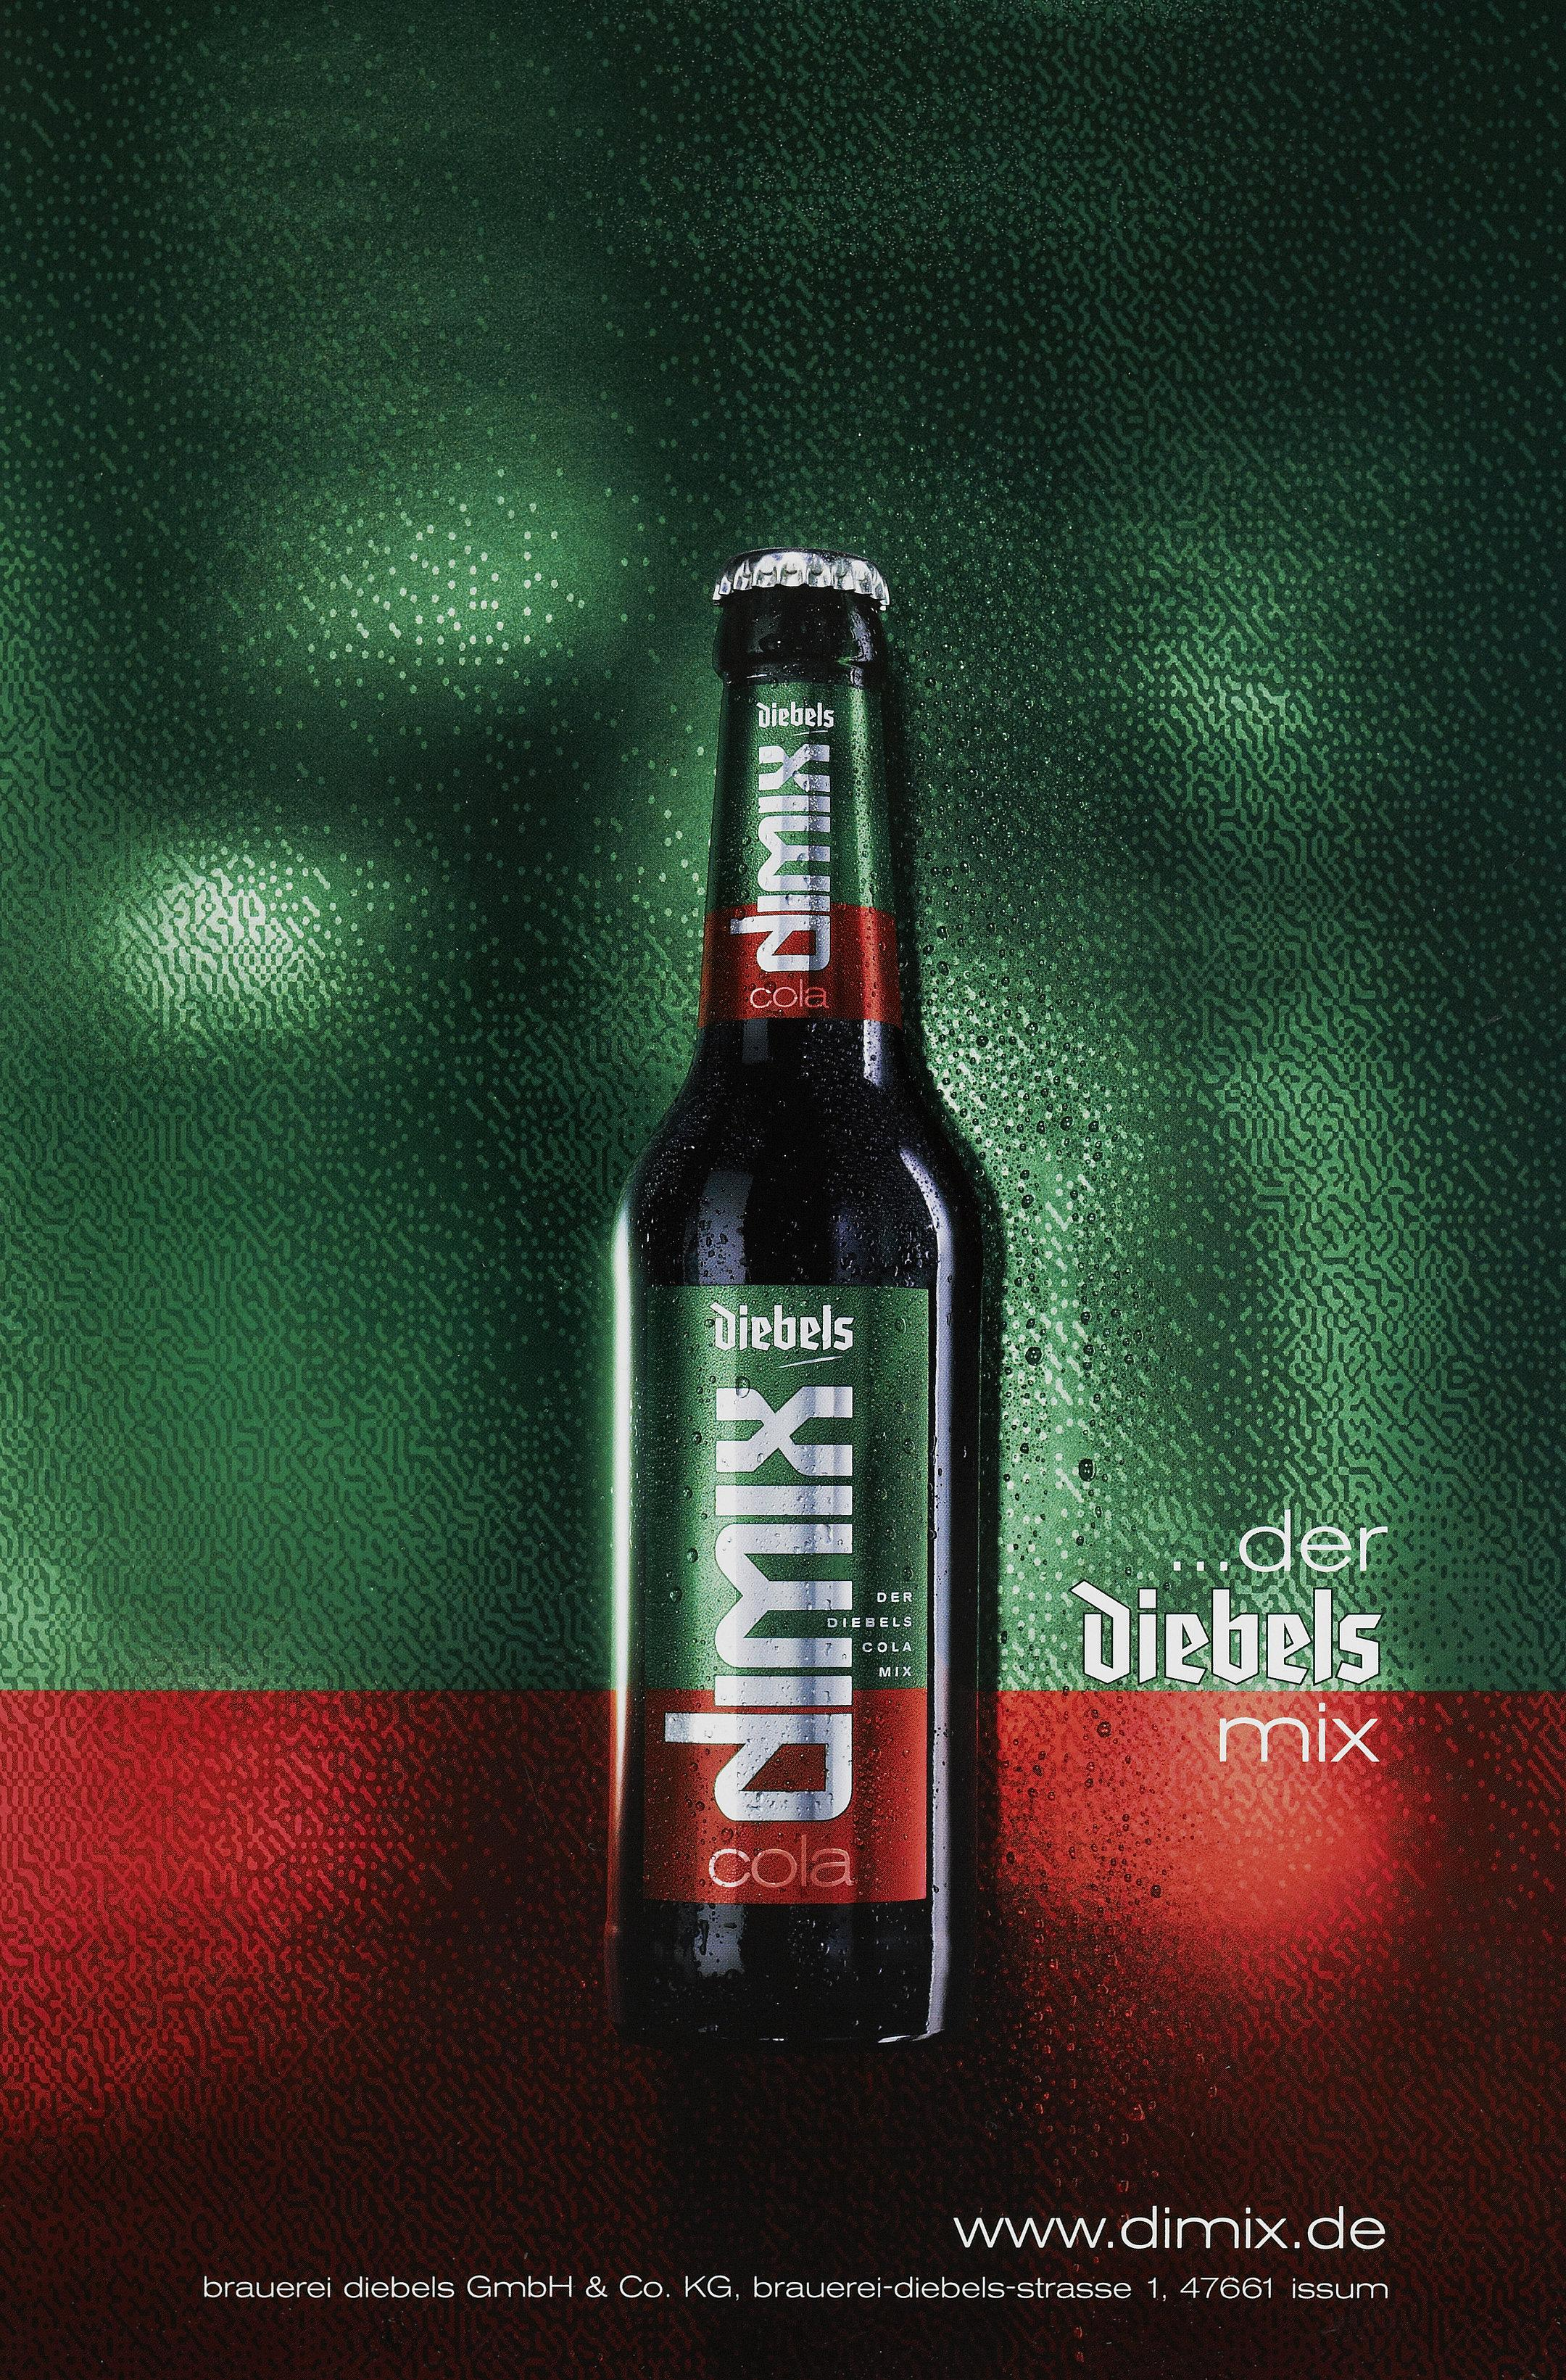 Dimix - Diebels Altbier mit Cola Mixgetränk